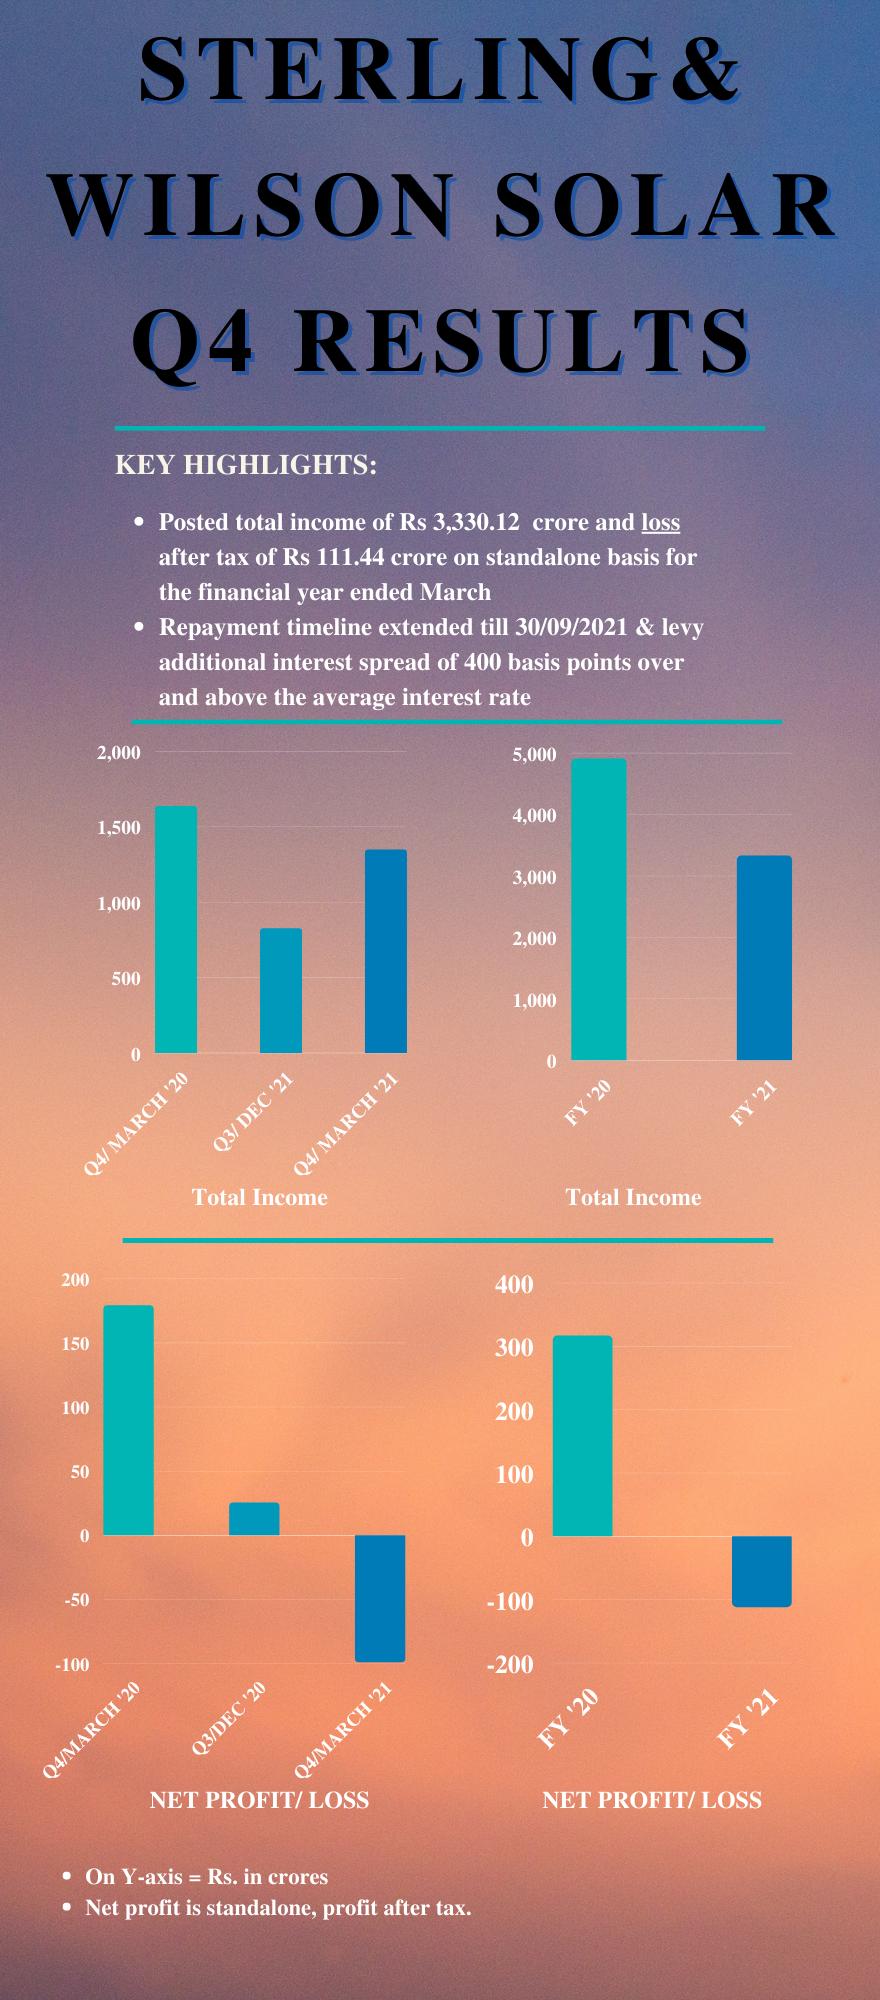 Q4 results SW Solar